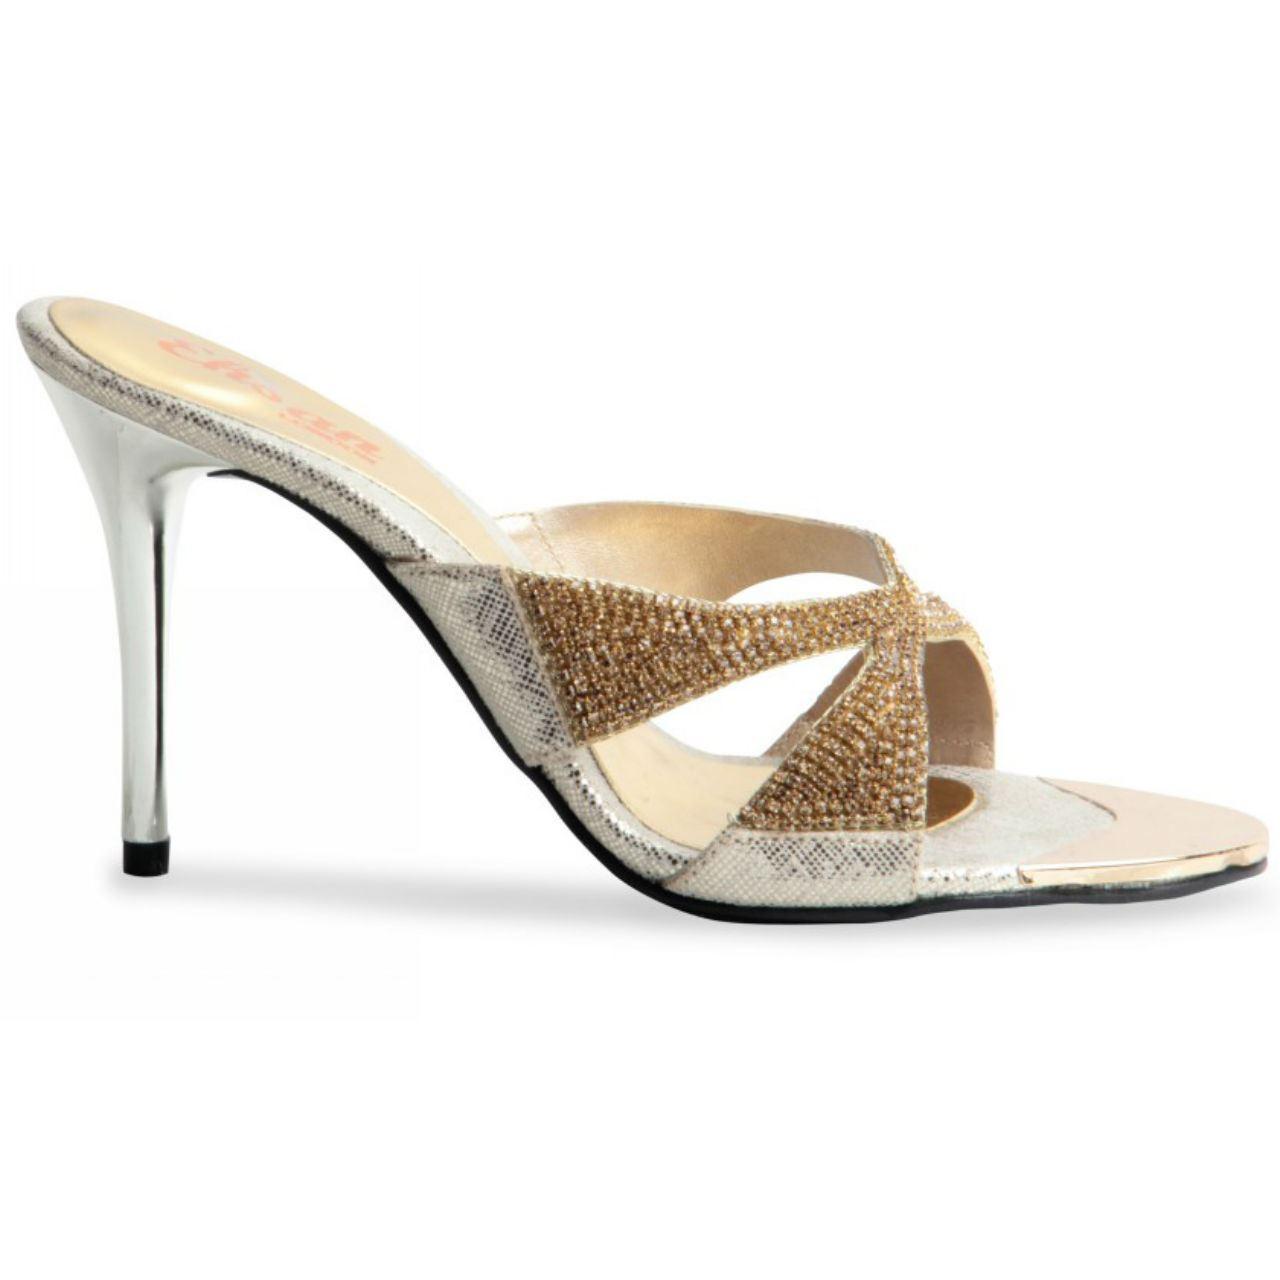 clothes shoes accessories women 39 s shoes sandals be